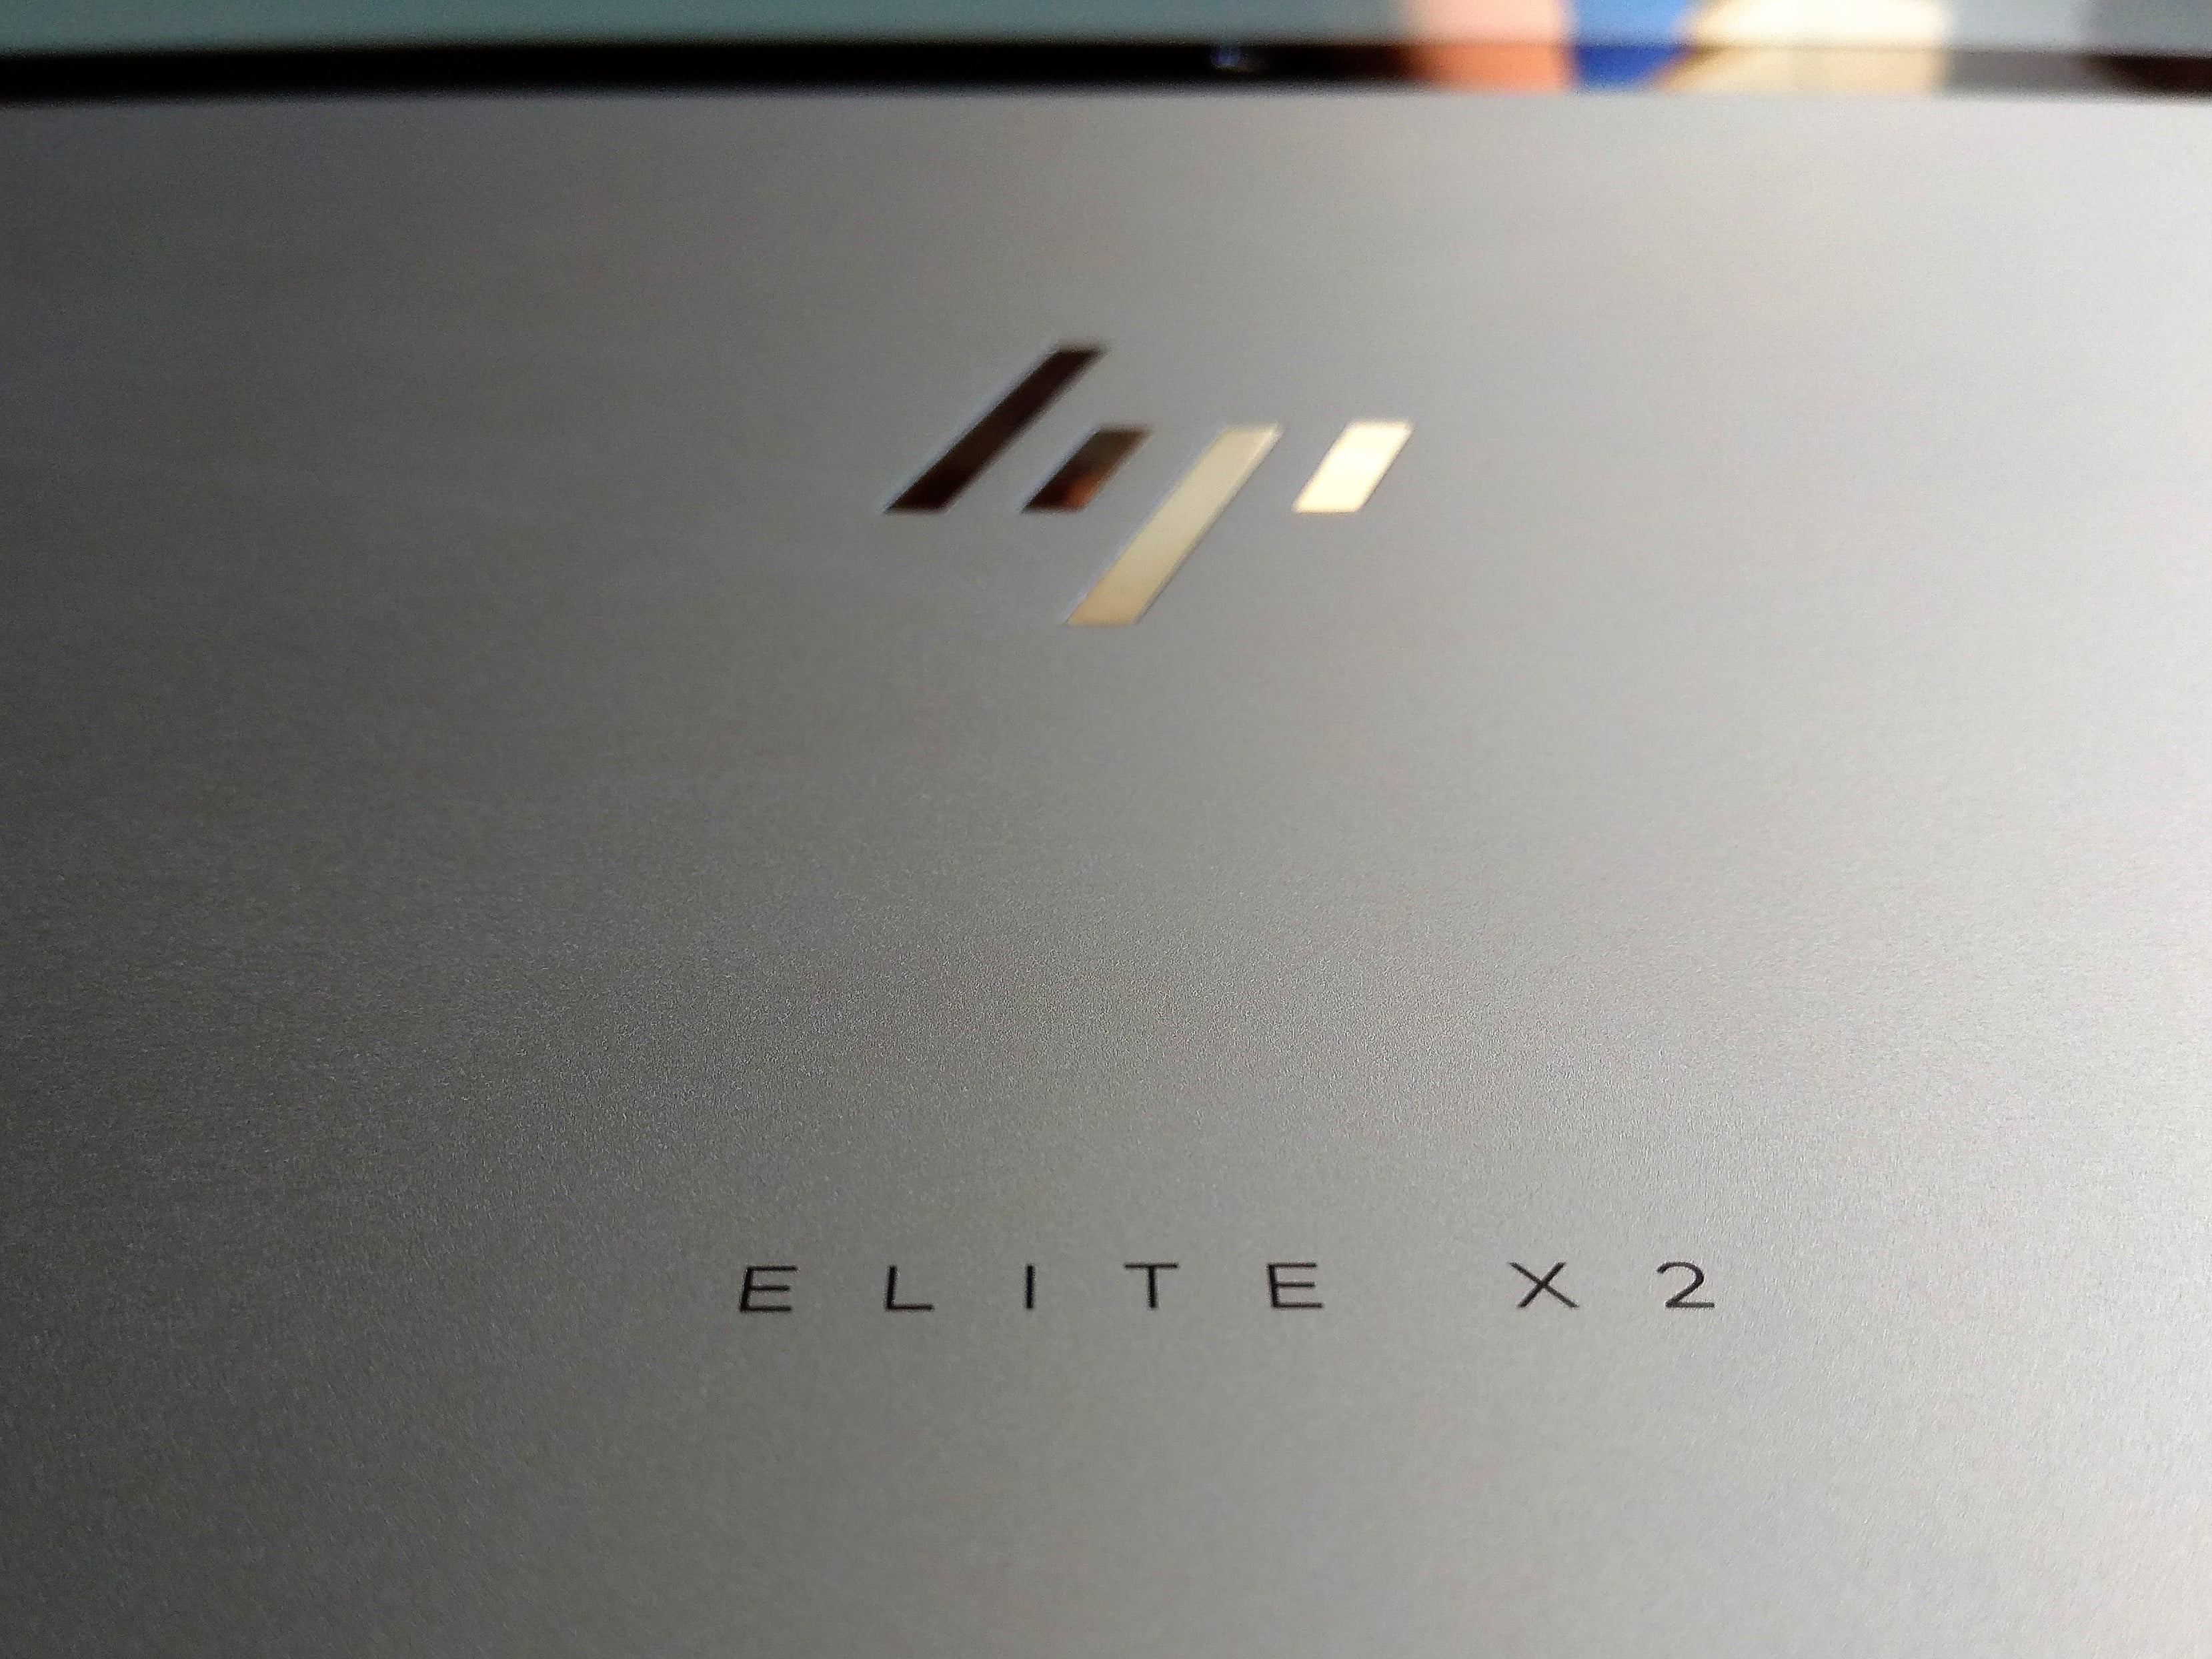 Recenzja HP Elite X2 - jak profesjonalna kobieta sukcesu 23